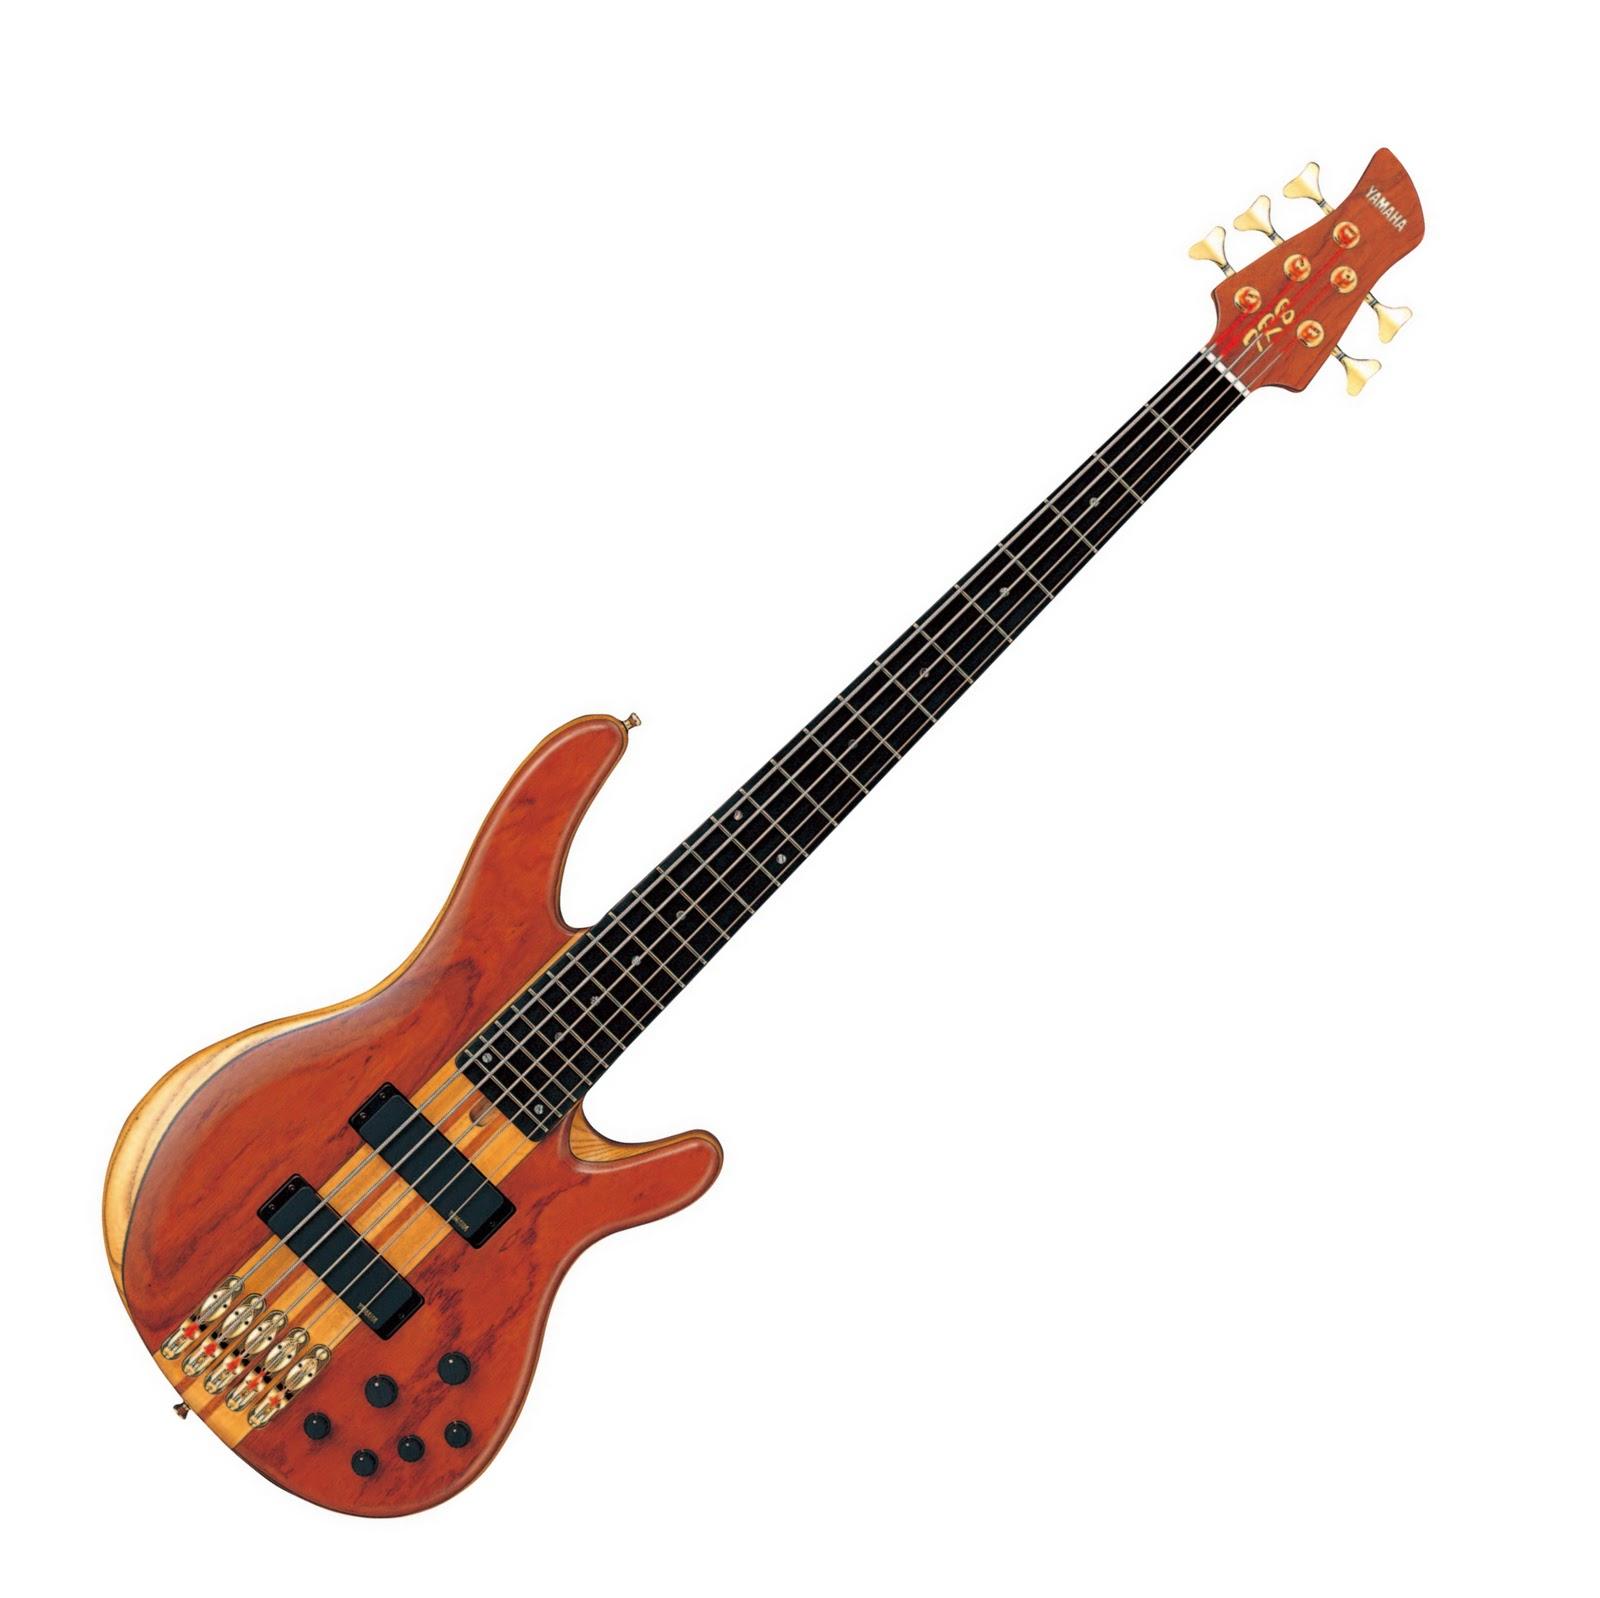 bass review for bassist yamaha trb5pii 5 string bass. Black Bedroom Furniture Sets. Home Design Ideas